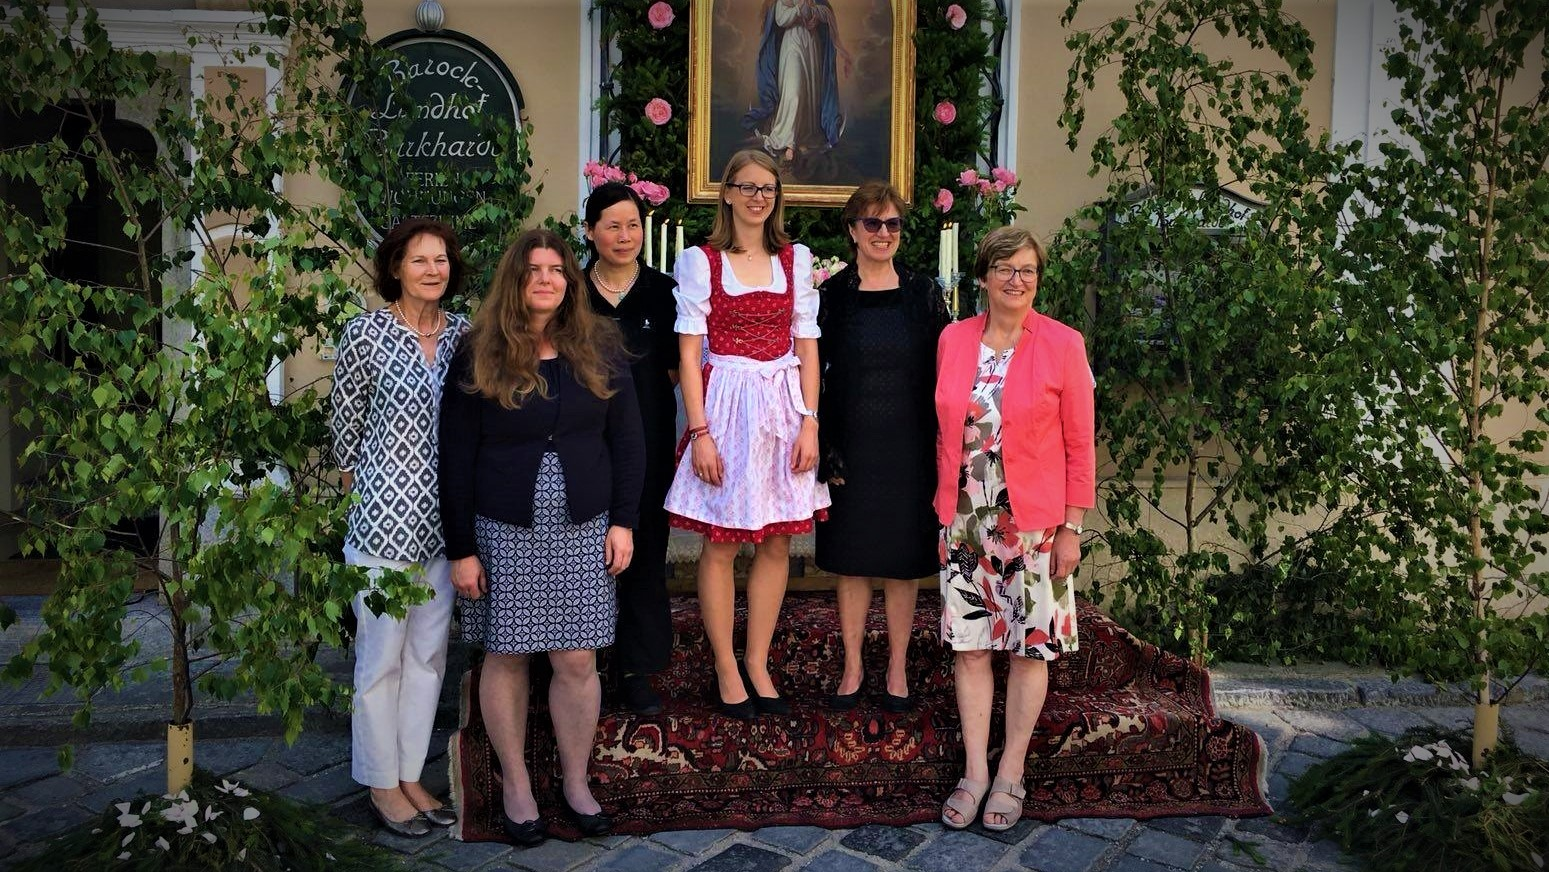 Barock - Landhof Burkhardt Hotel Team